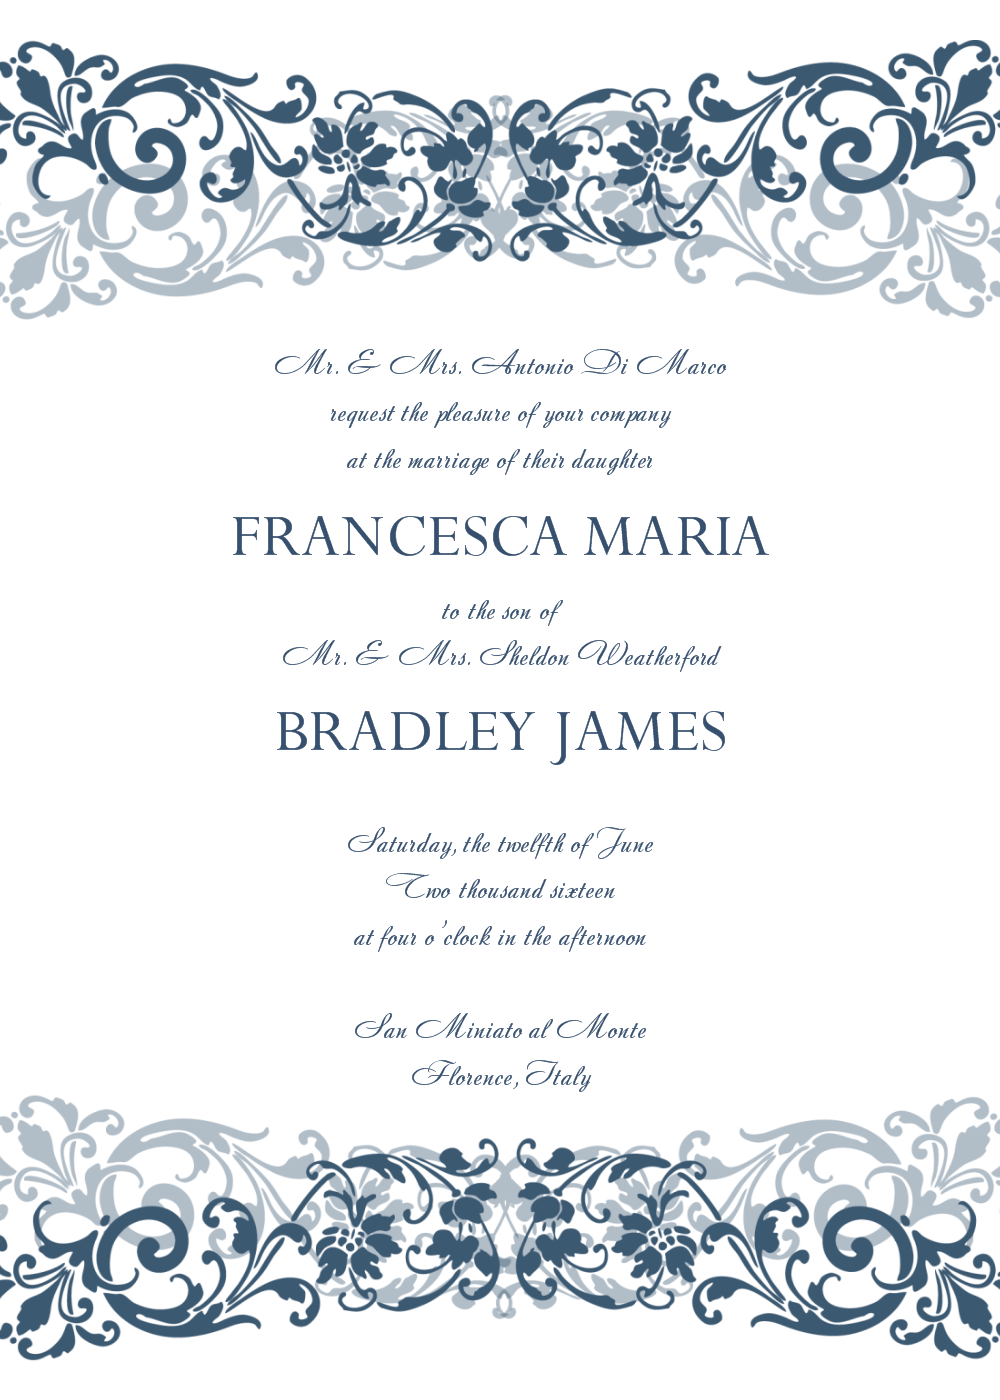 Free Printable Wedding Reception Invitation Templates